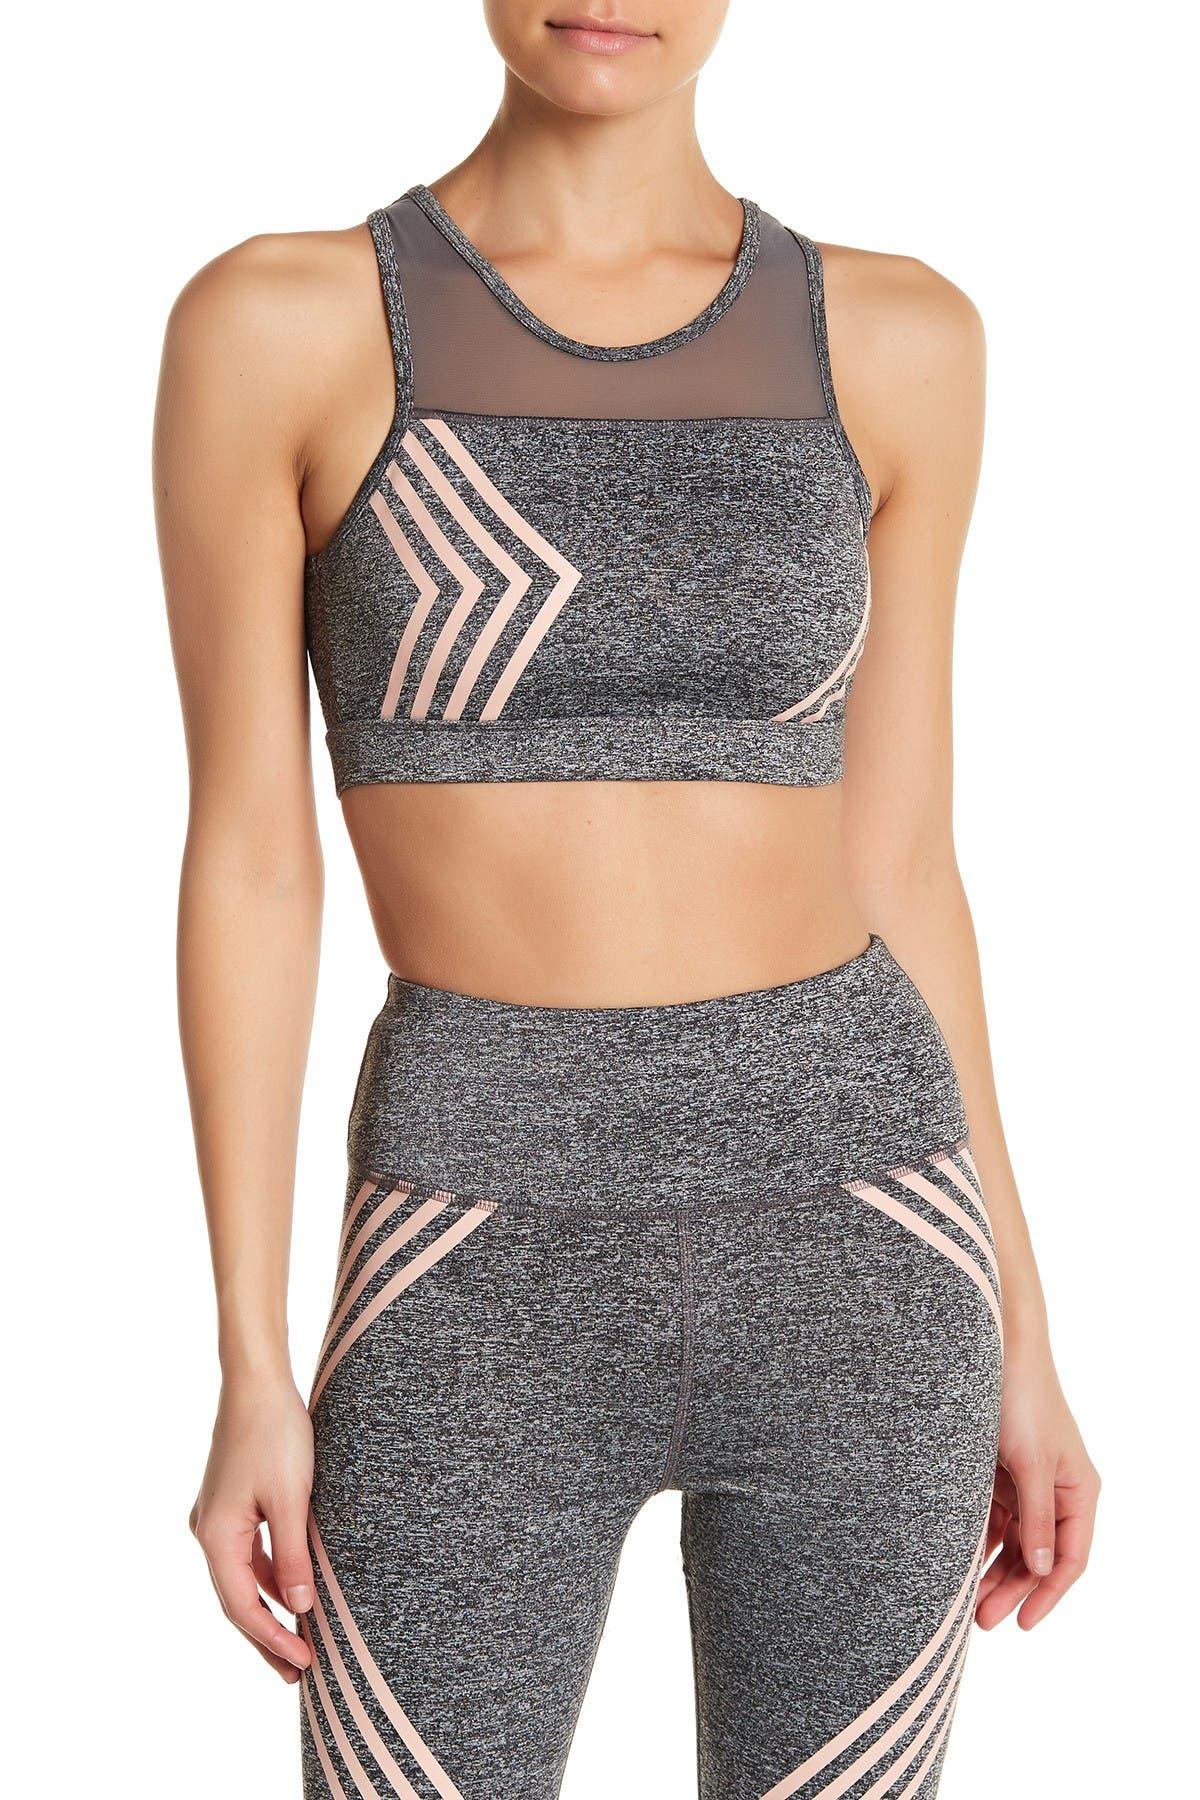 Image of C & C California Stripe Mesh Sports Bra